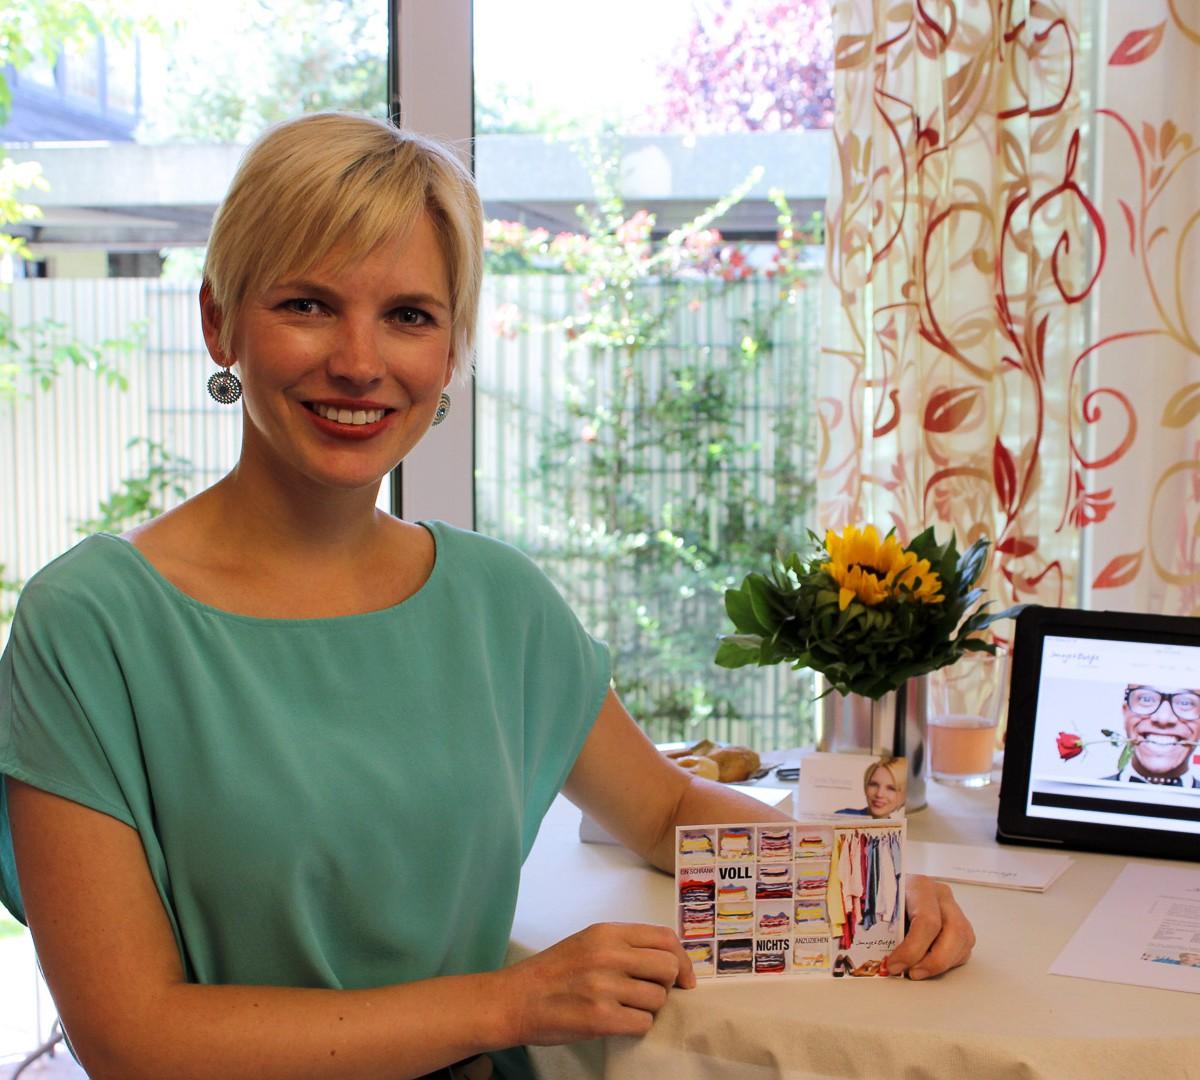 Carola Nahnsen Image und Outfitoptimierung